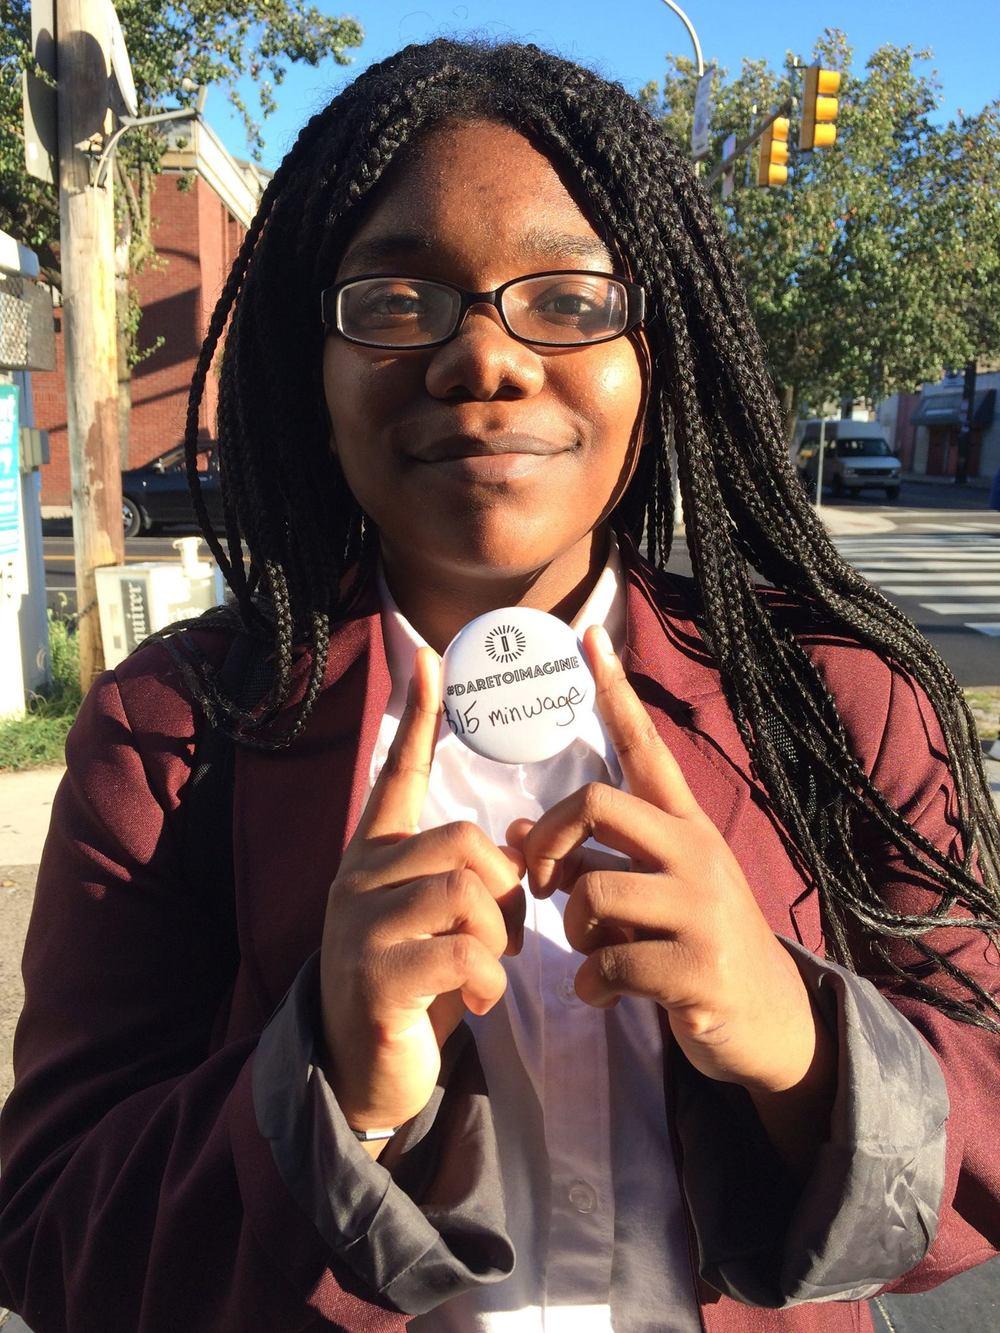 DareToImagine button maker at Germantown Imagination Station at Greene Street and Chelten Avenue. (Photo by Yolanda Wisher, October 2016)